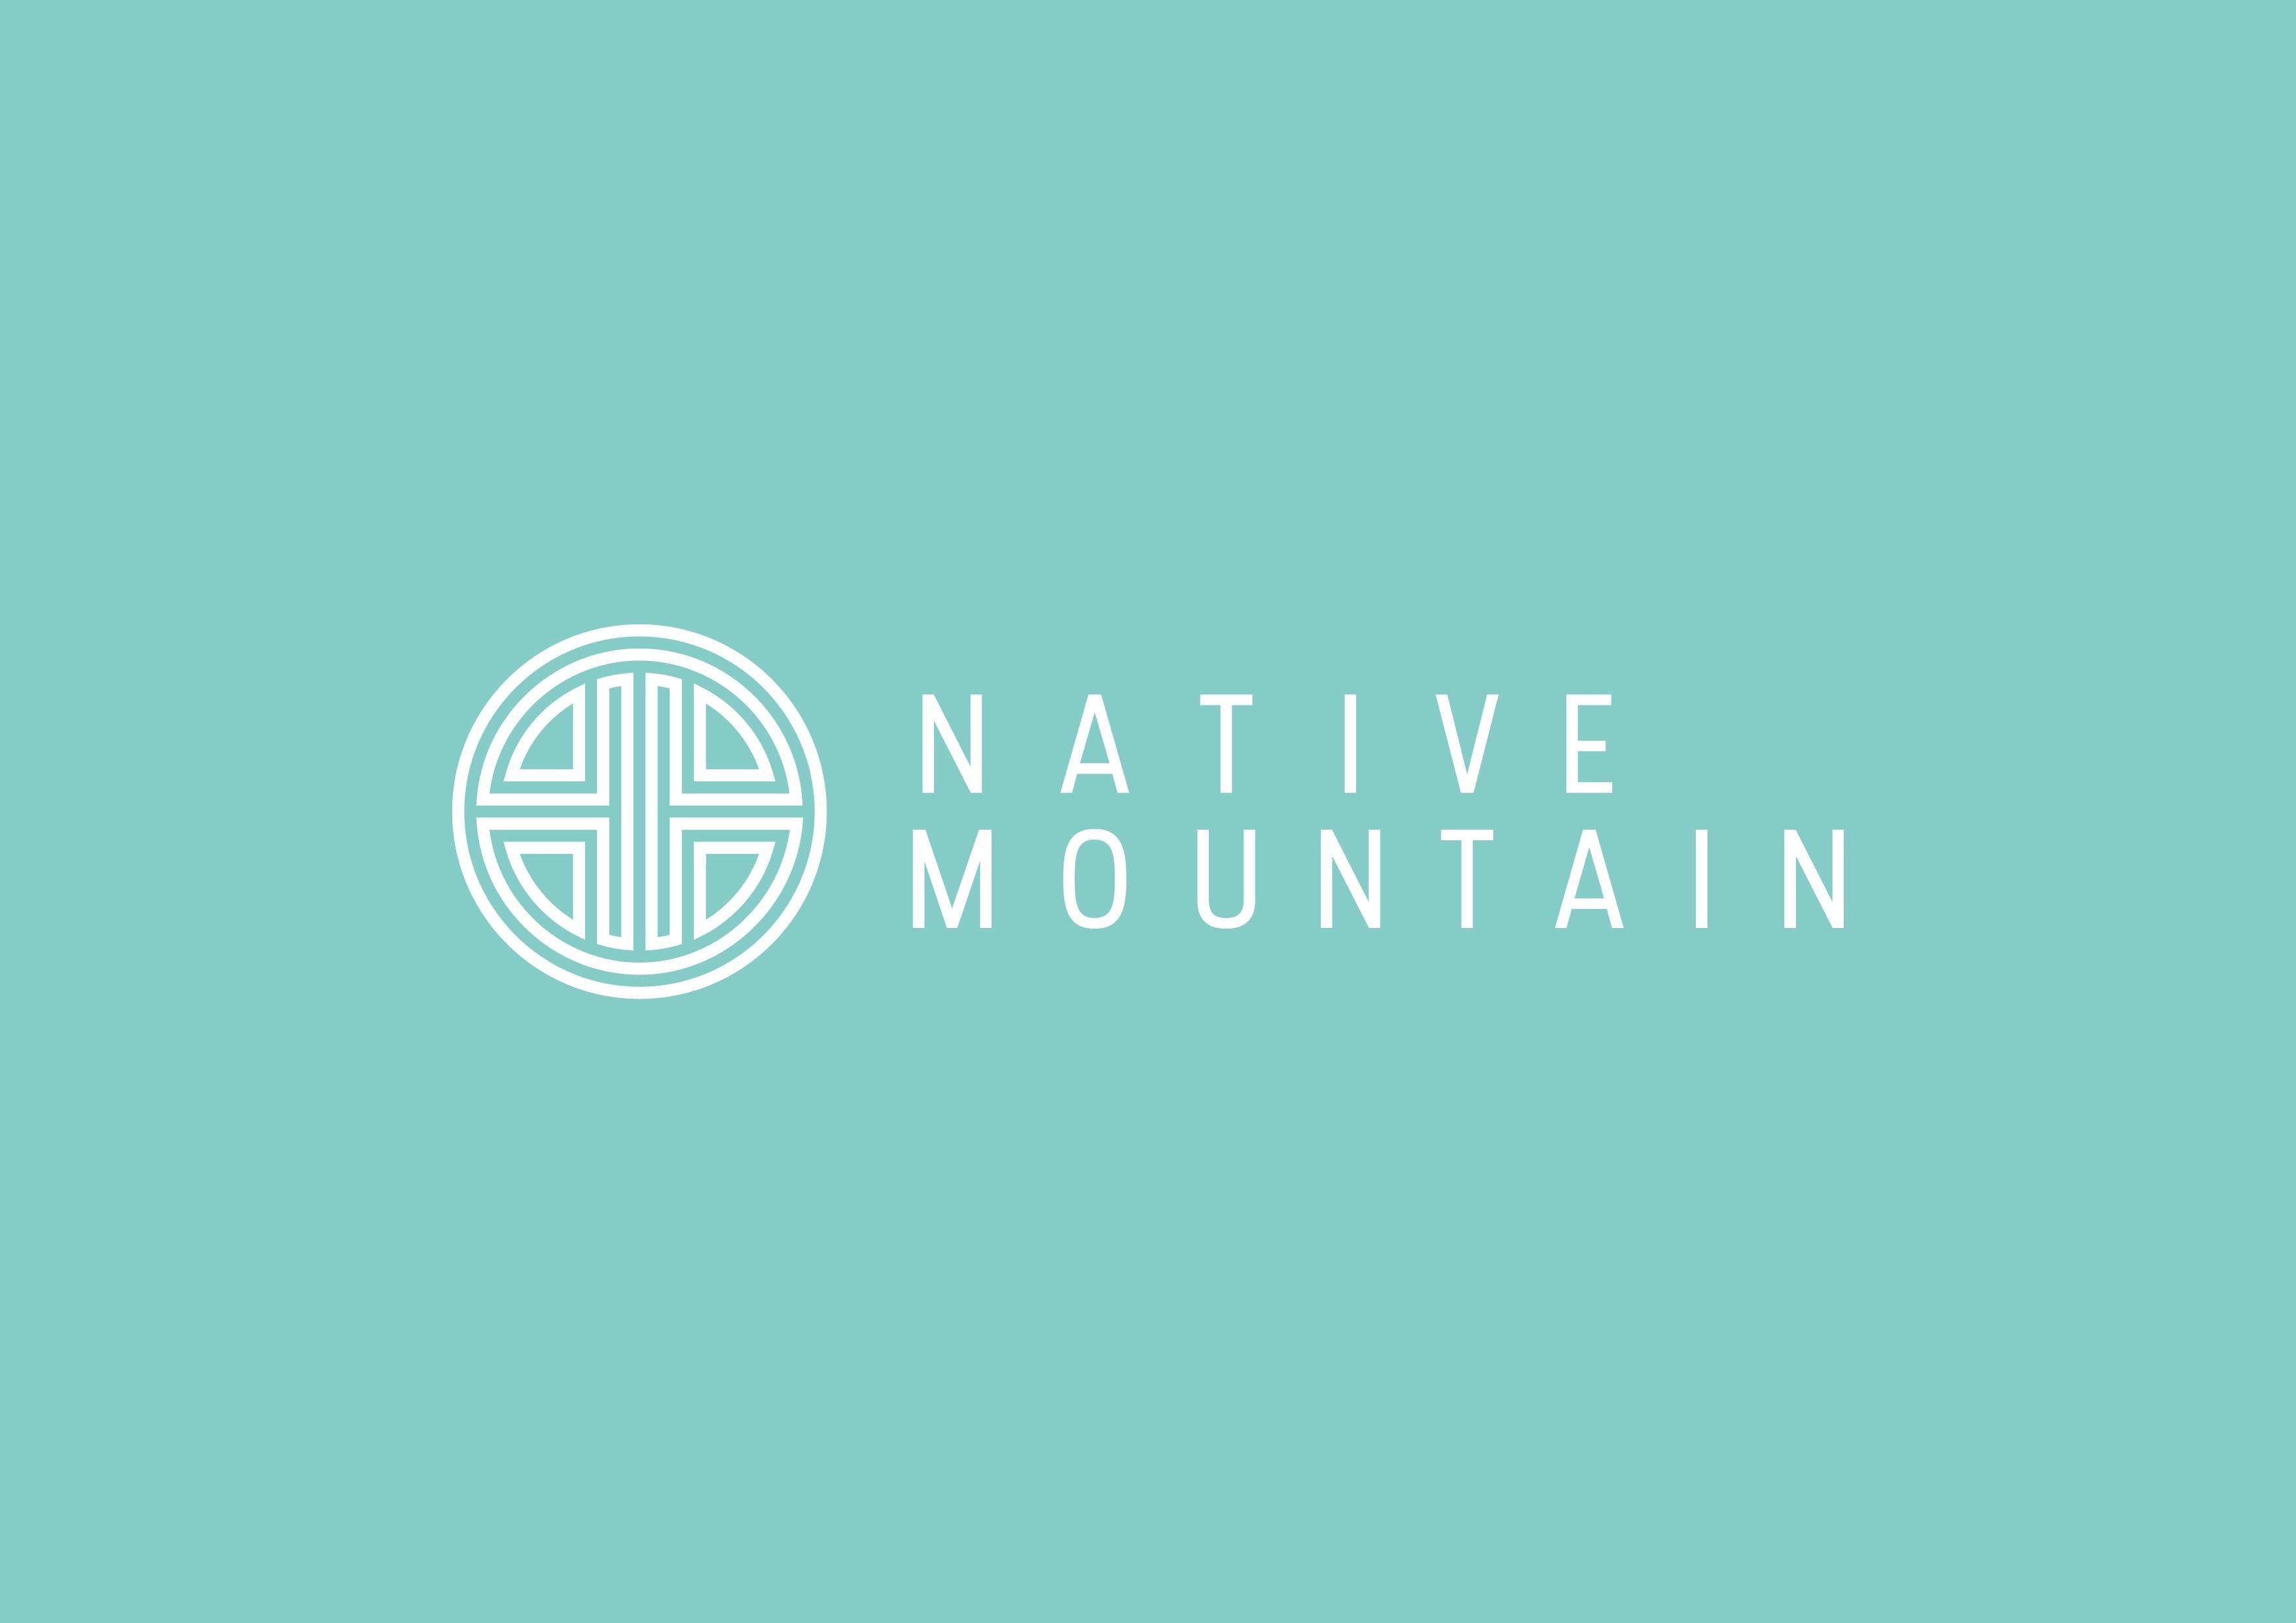 Design a crisp logo and business card for Native Mountain